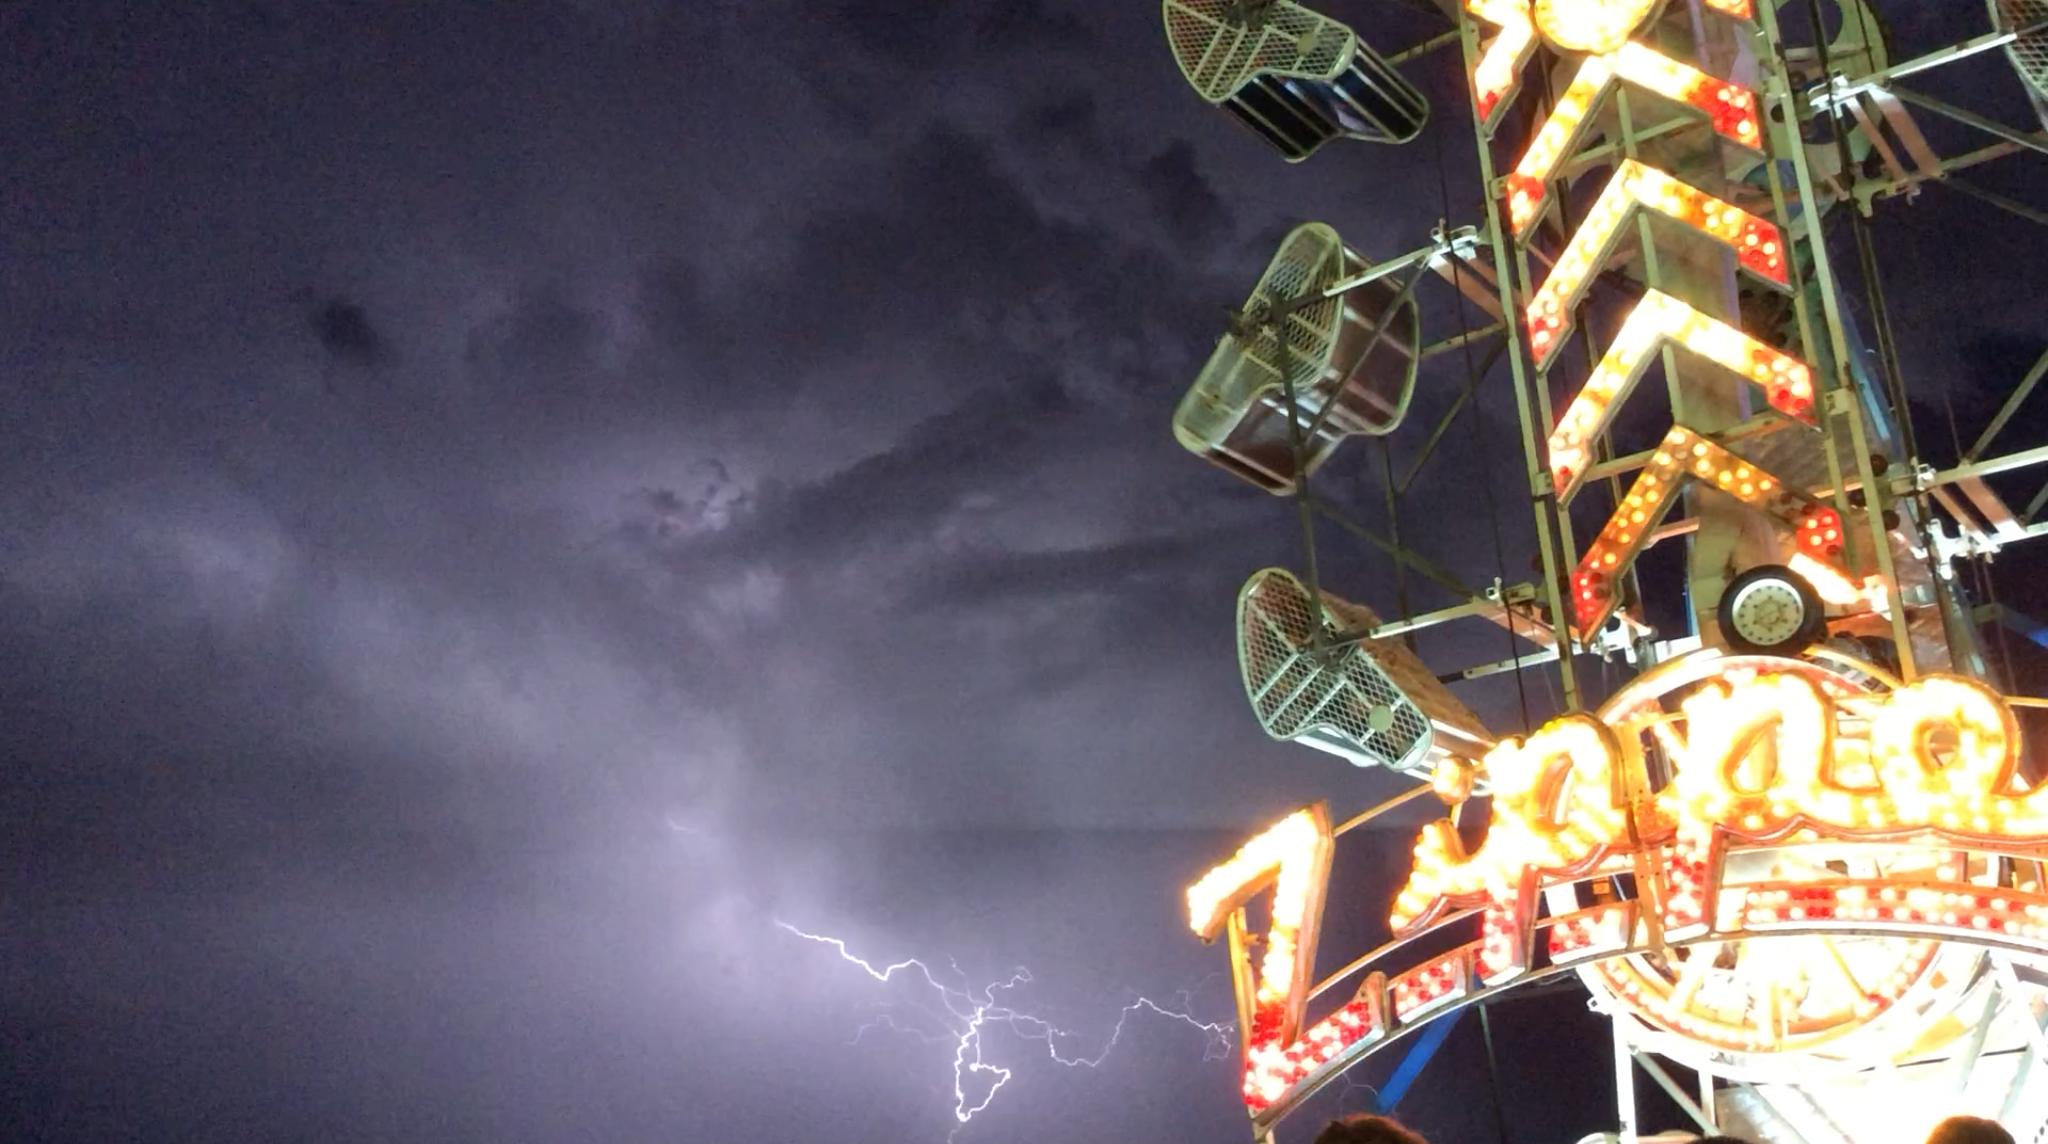 Lightning threatens the fun, but the Washington County Fair goes on. Hurricane, Utah, Aug. 10, 2016 | Photo by Cami Cox Jim, St. George News